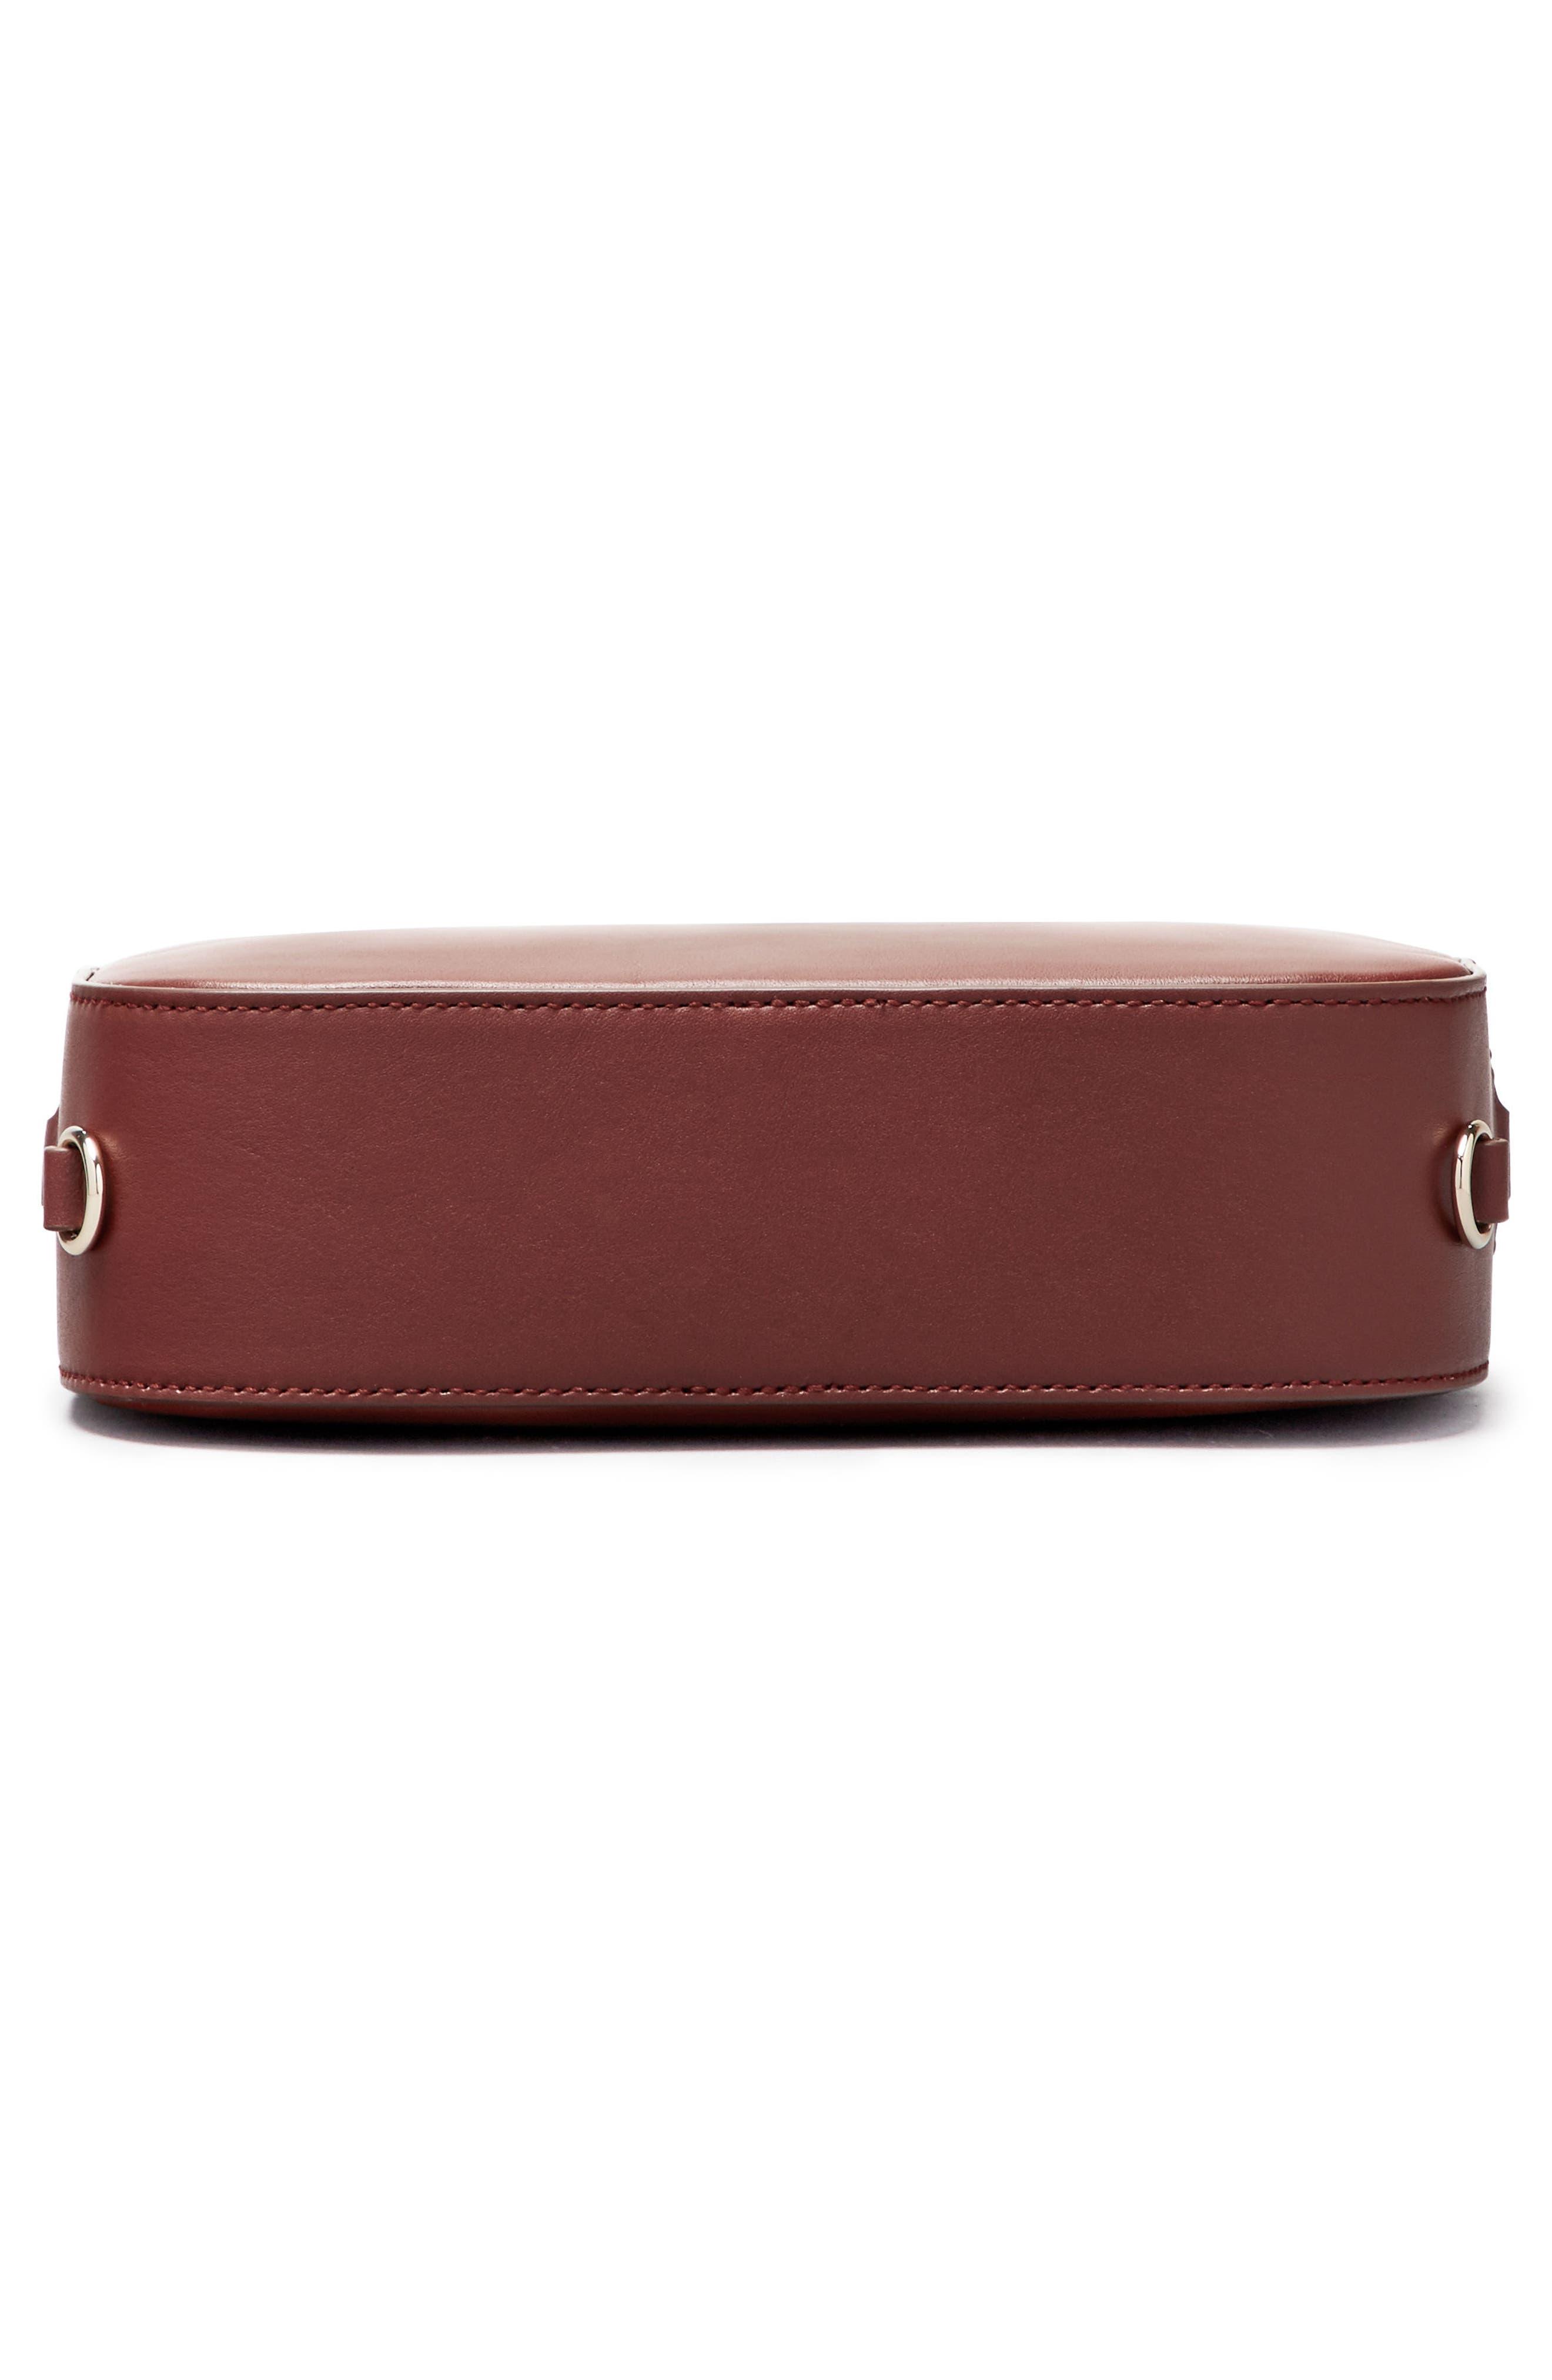 Bigger Leather Camera Bag,                             Alternate thumbnail 25, color,